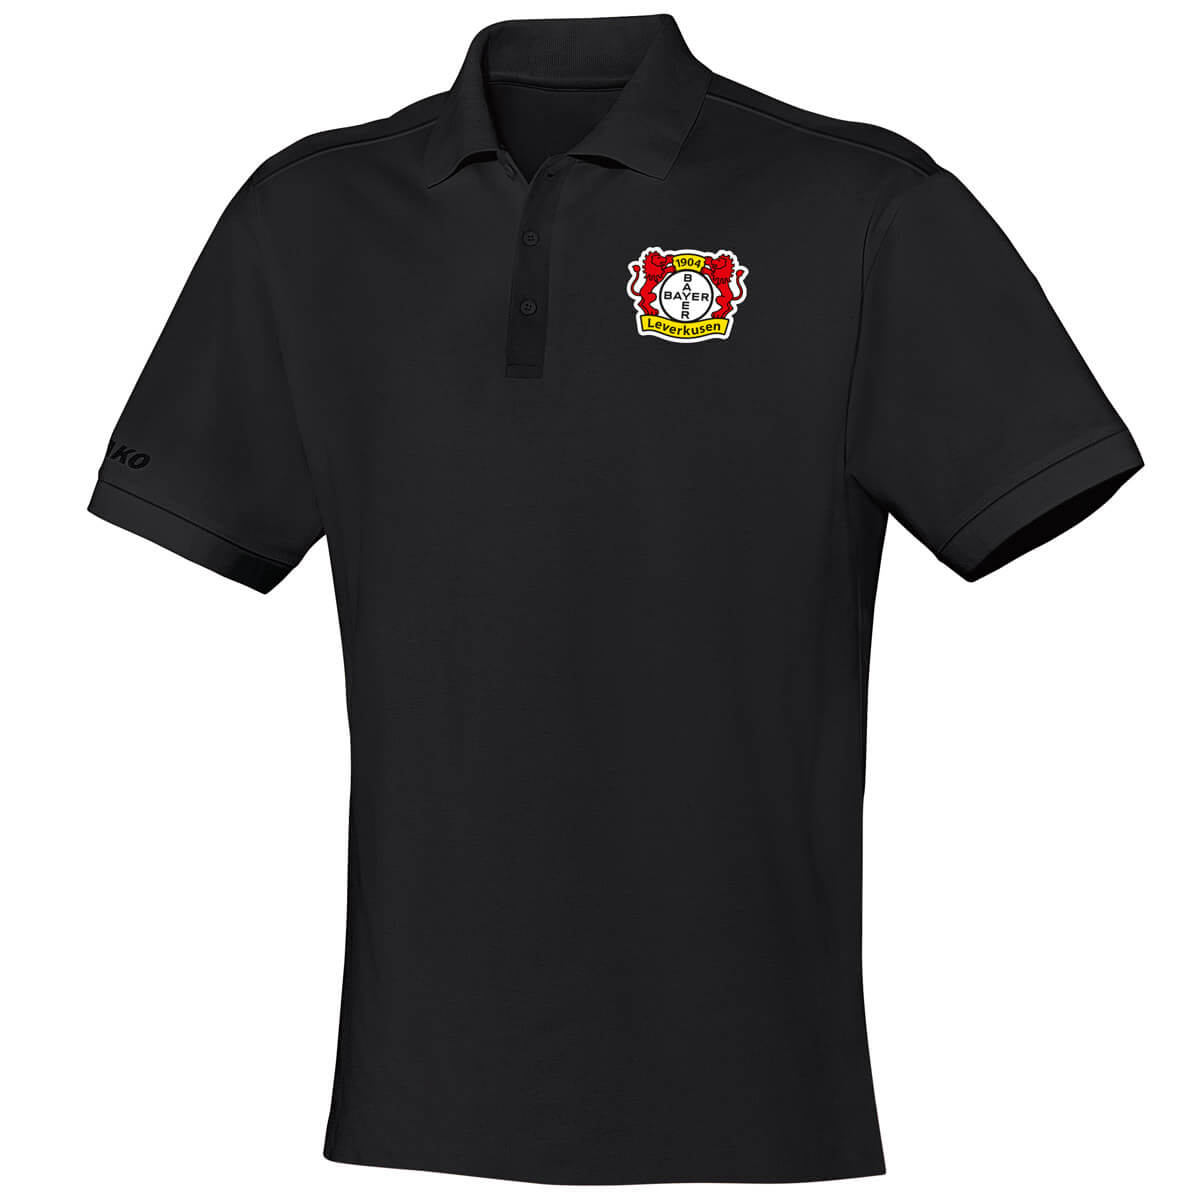 Bayer 04 Leverkusen Polo Team - Kinder | Jako BA6333